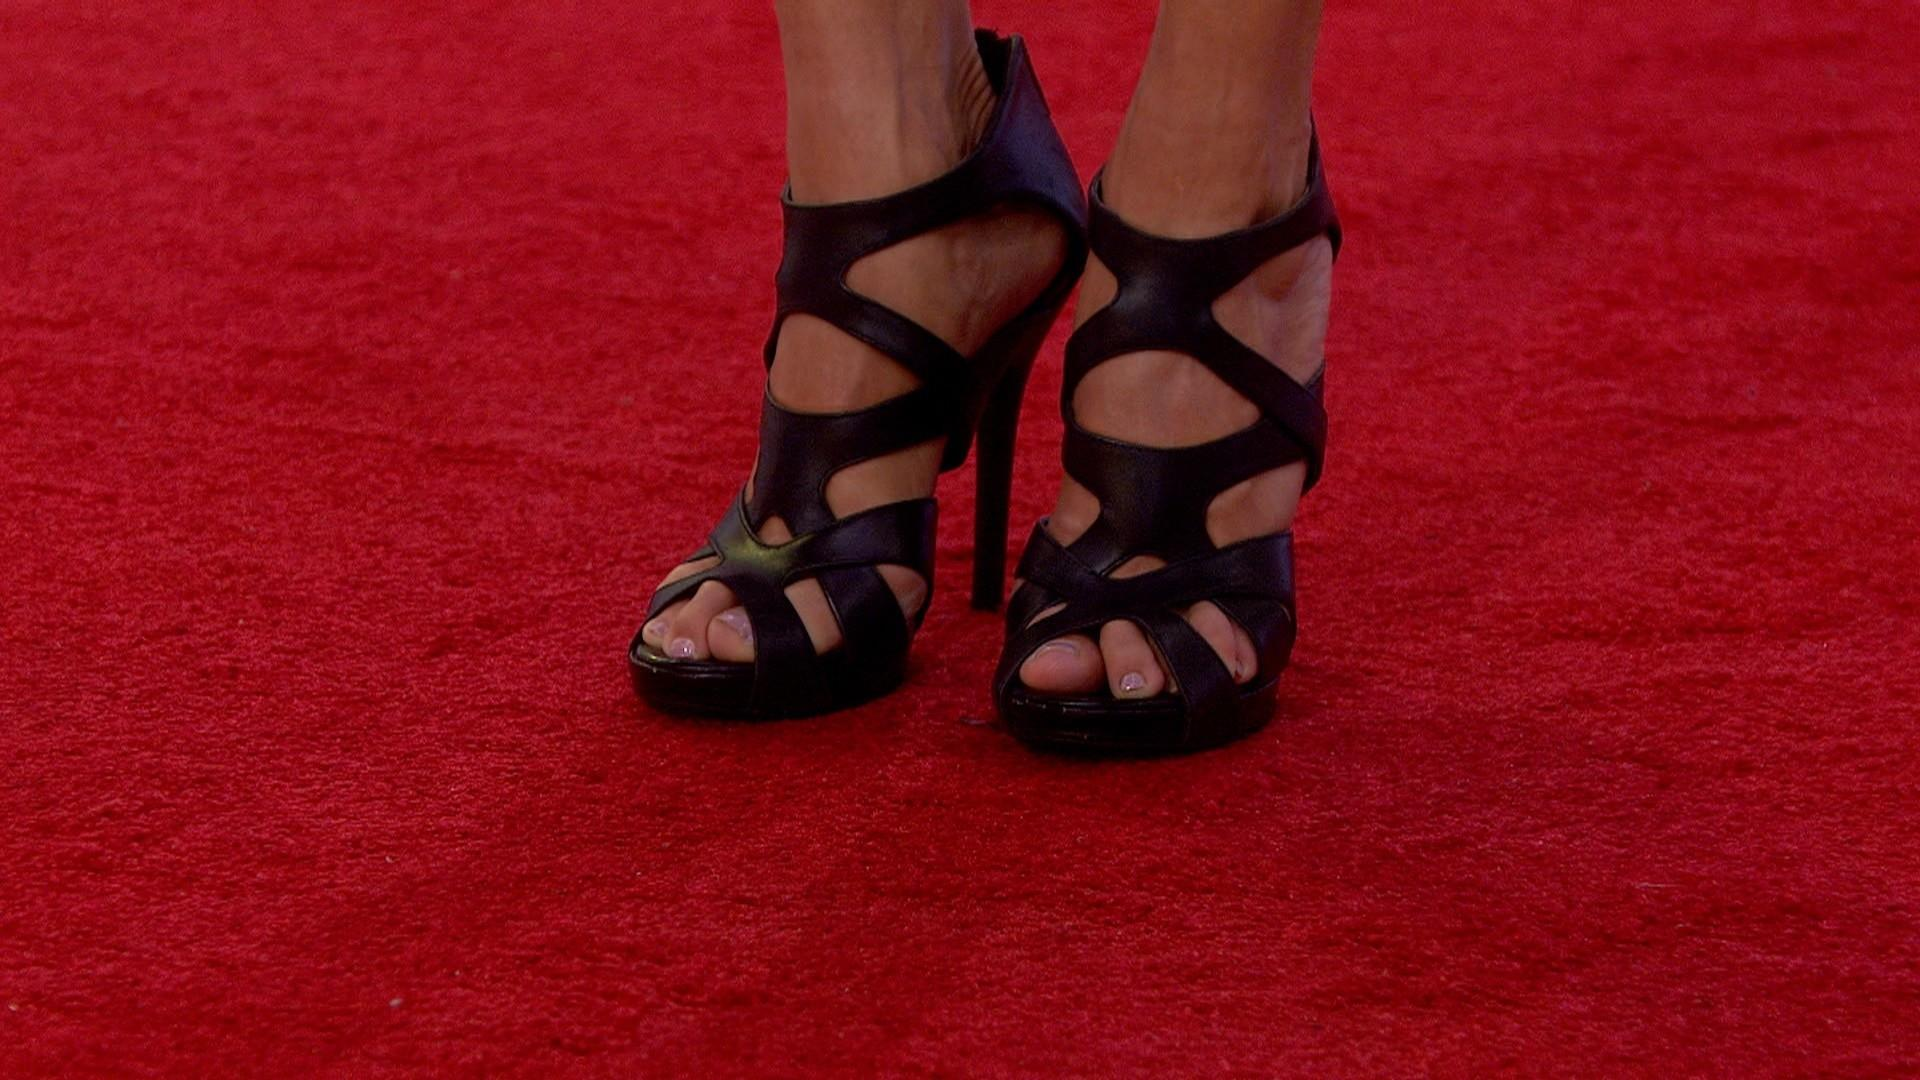 75e84237f72 Easy ways to make high heels more comfortable